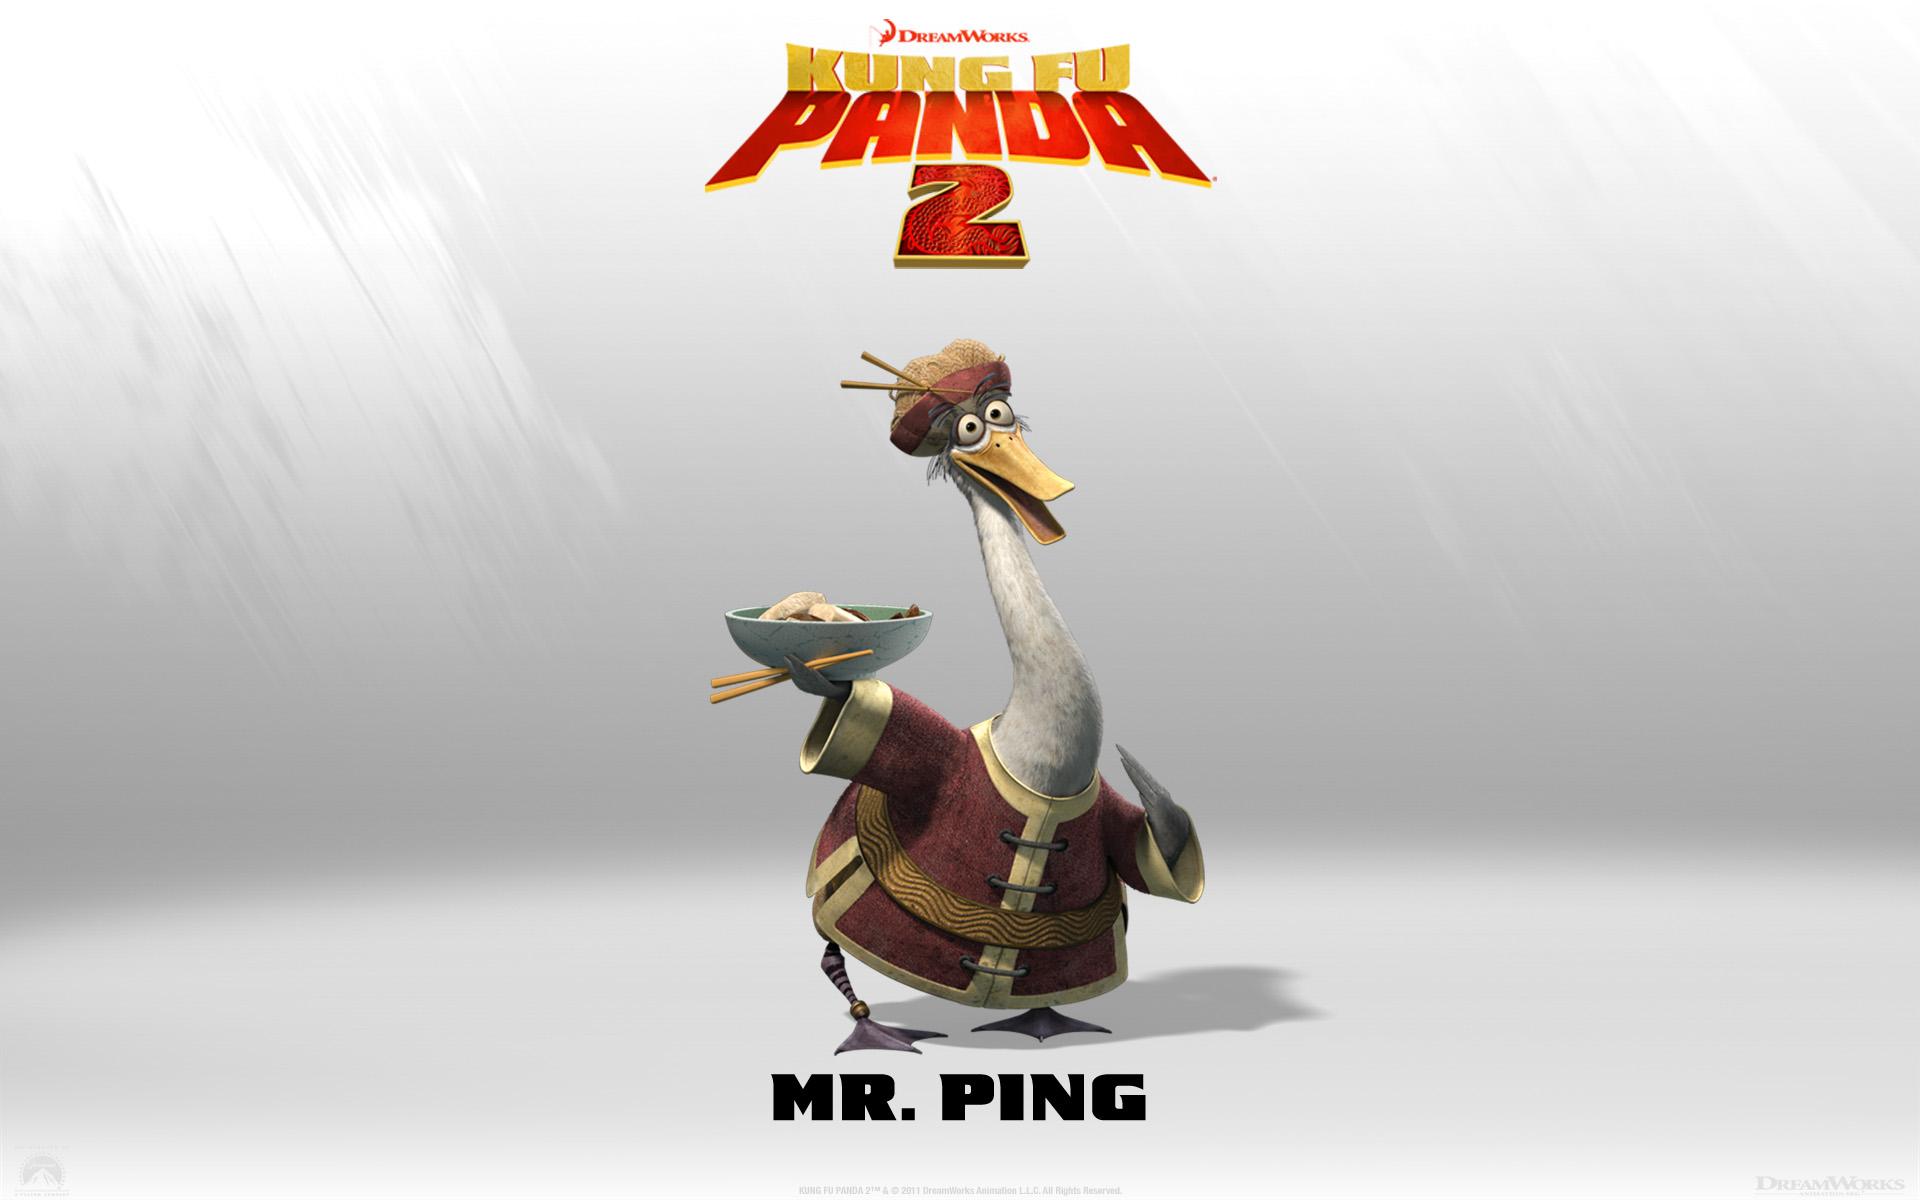 Mr Ping From Kung Fu Panda 2 Movie Desktop Wallpaper 1920x1200